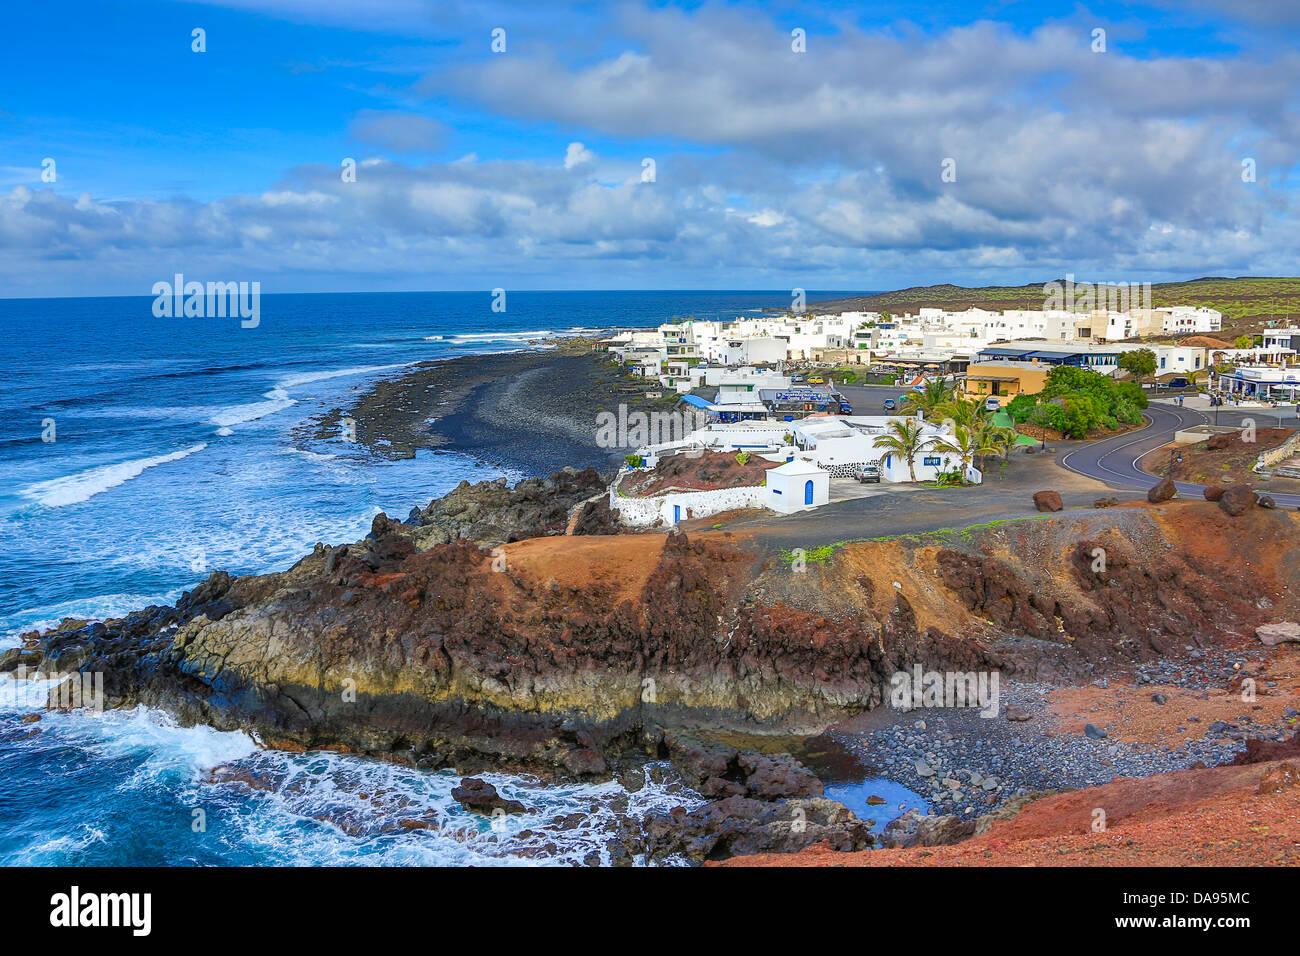 Spanien, Europa, Kanarische Inseln, Lanzarote, Nationalpark, Vulkan, Strand, blau, Küste, Ökologie, el Stockbild